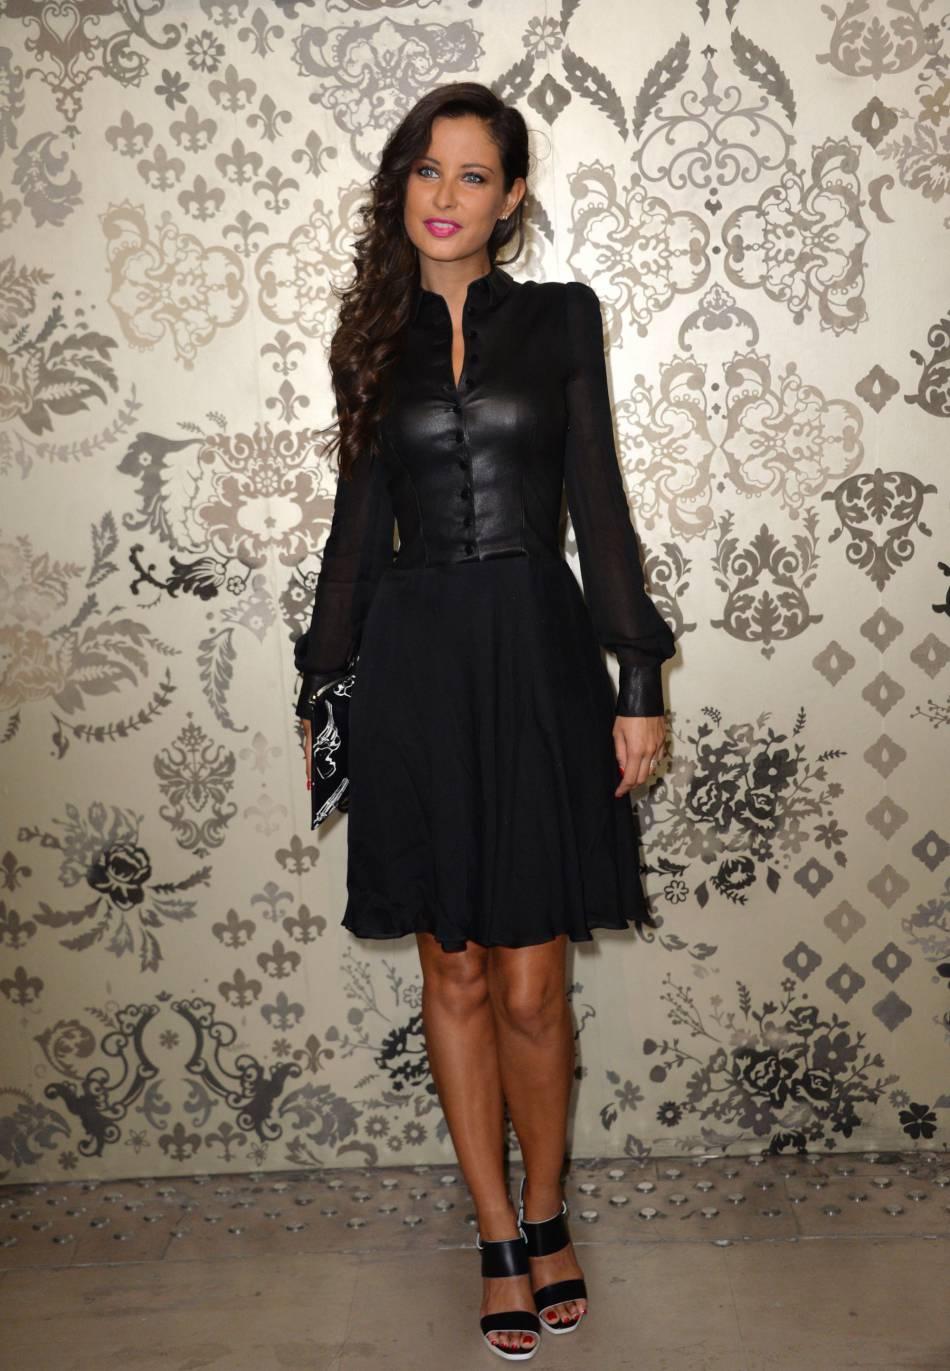 Malika Ménard aime autant les petites robes en cuir que les leggings.